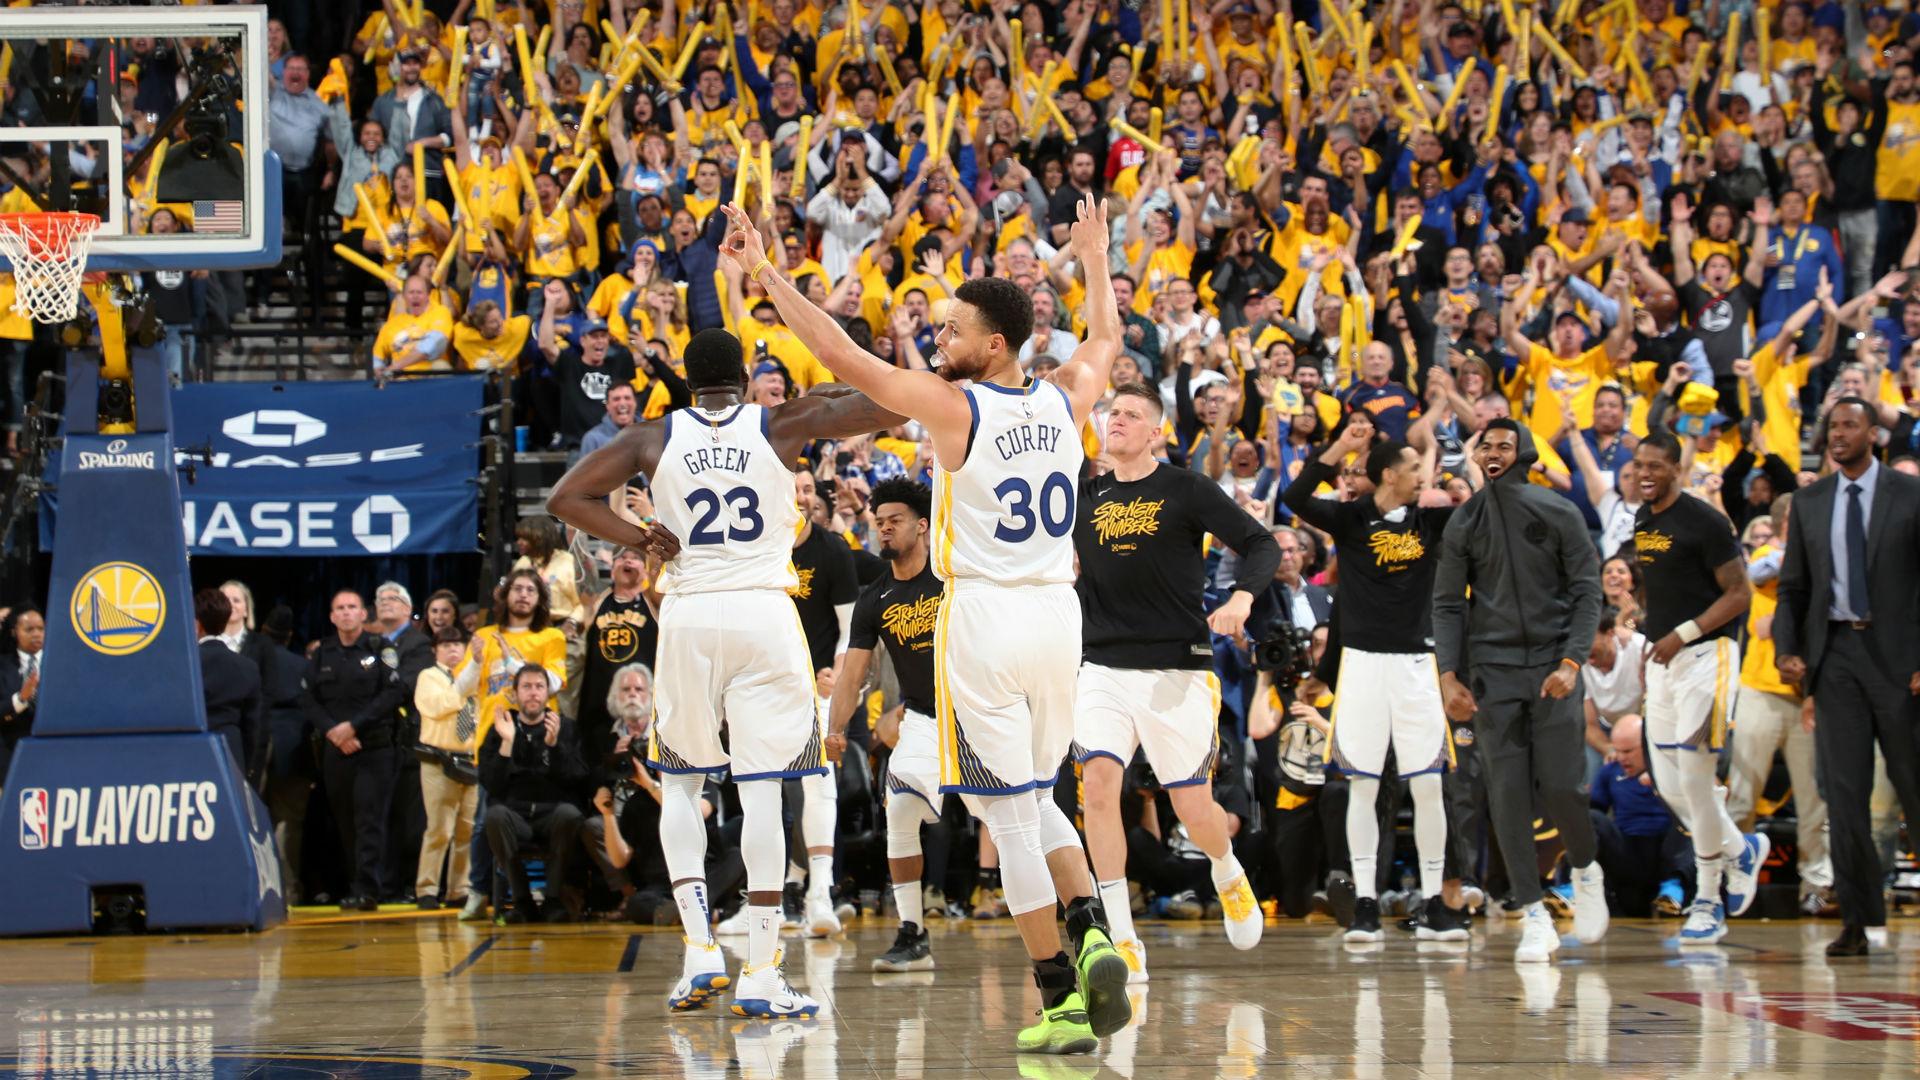 NBA Playoffs 2019: Houston Rockets Vs. Golden State